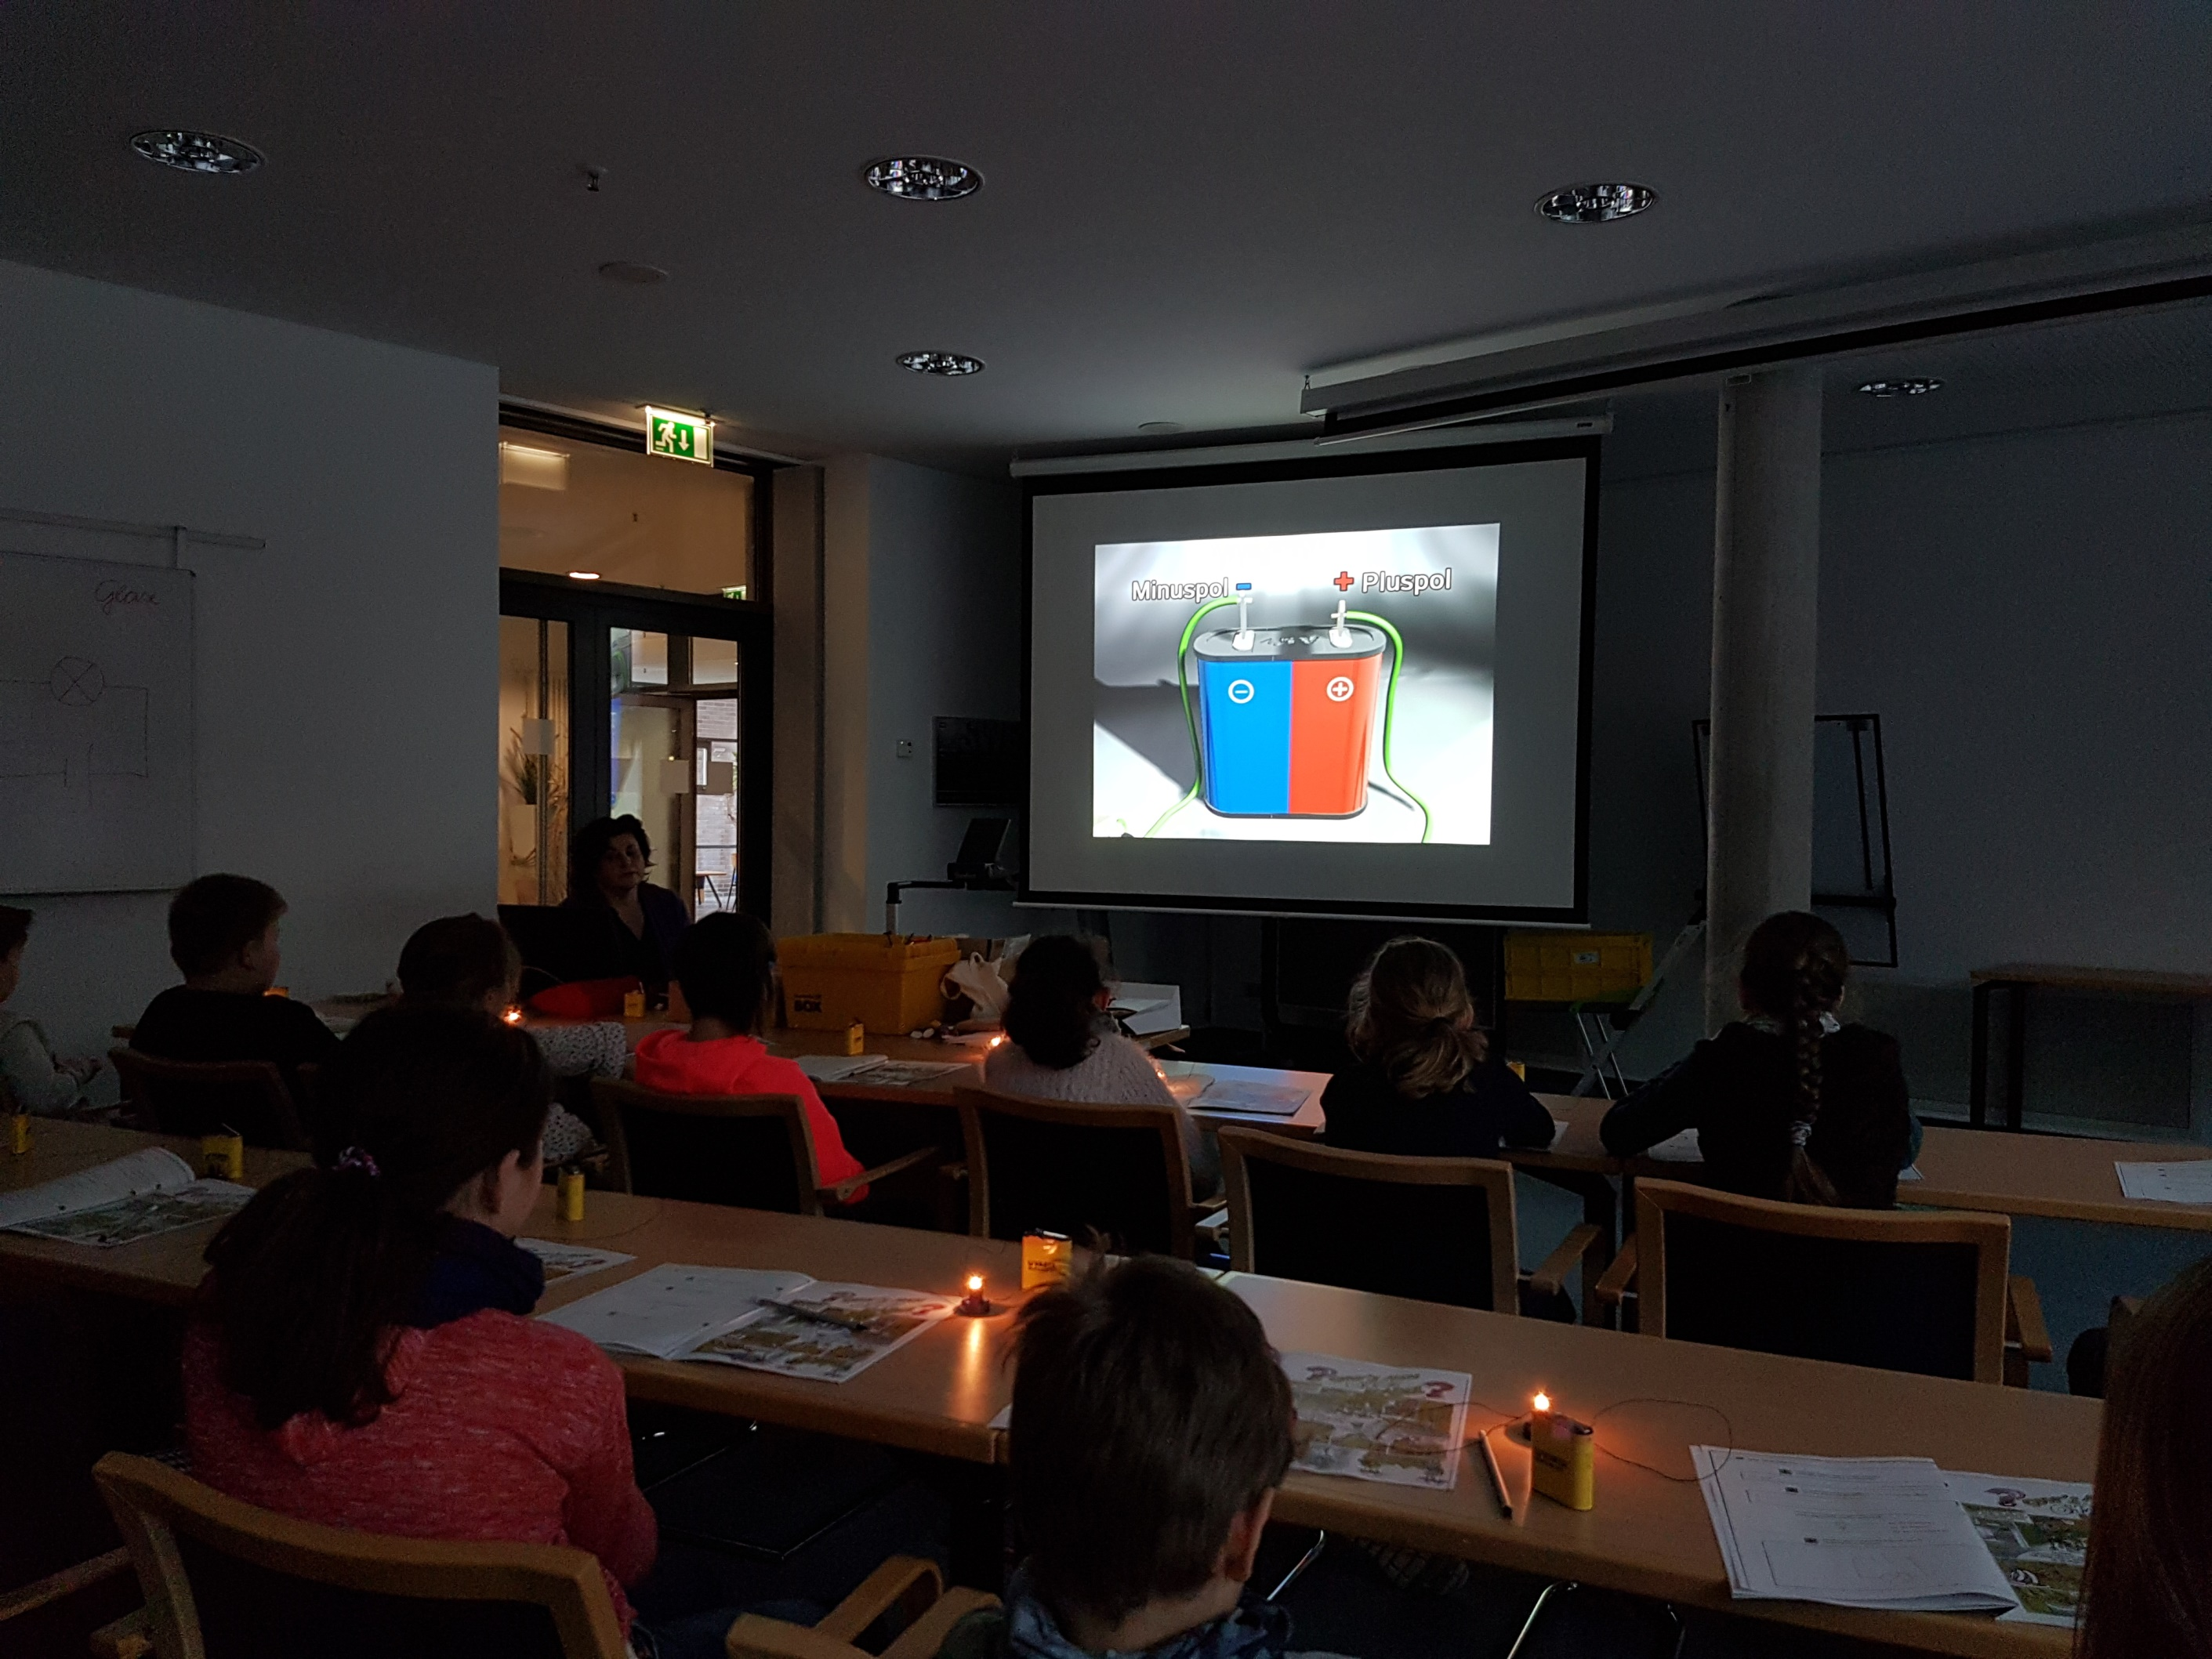 Großartig 6 Leitungsdraht Galerie - Der Schaltplan - greigo.com